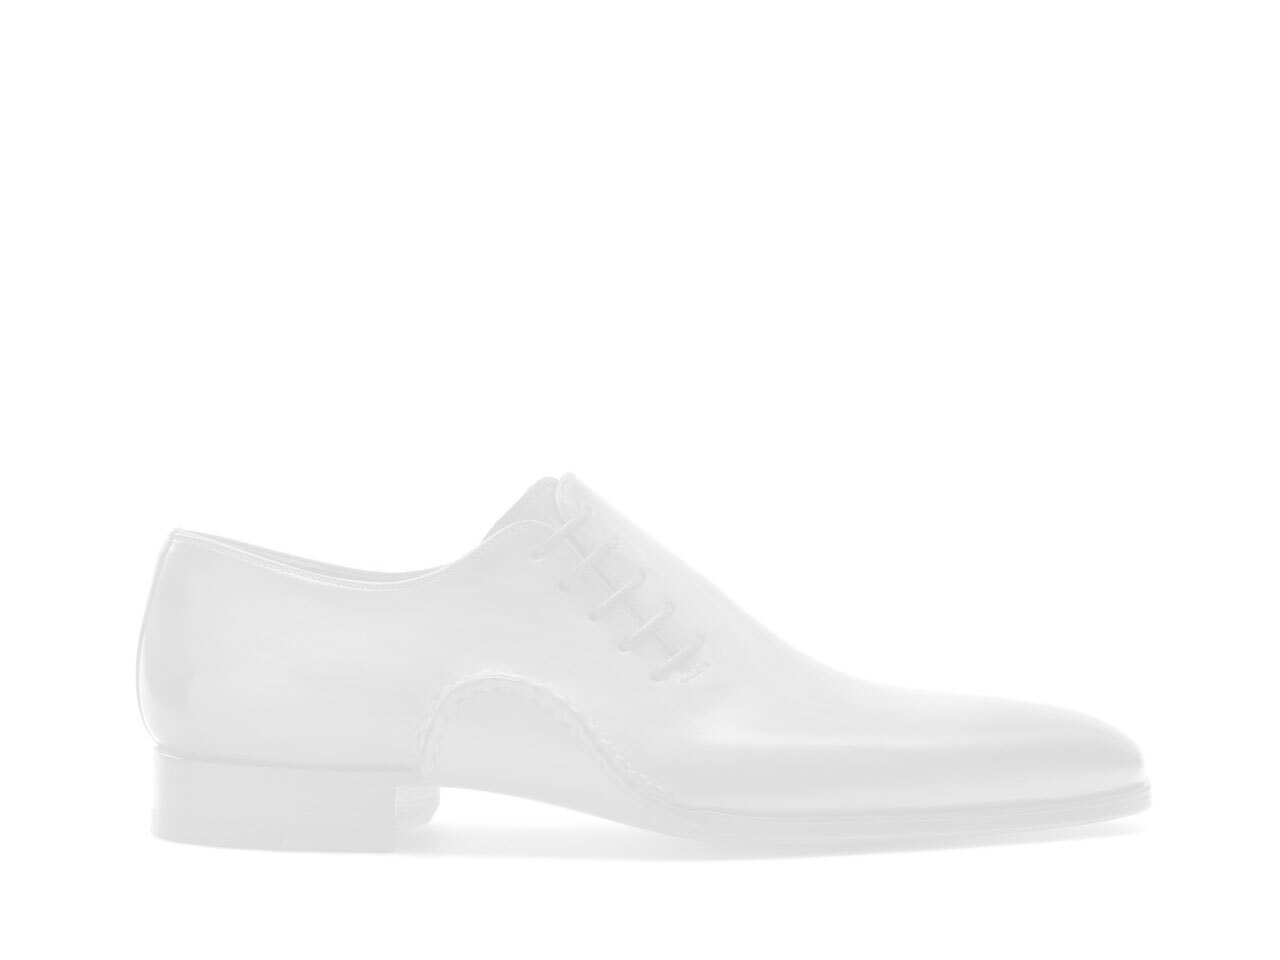 Sole of the Magnanni Nico Cuero Men's Sneakers